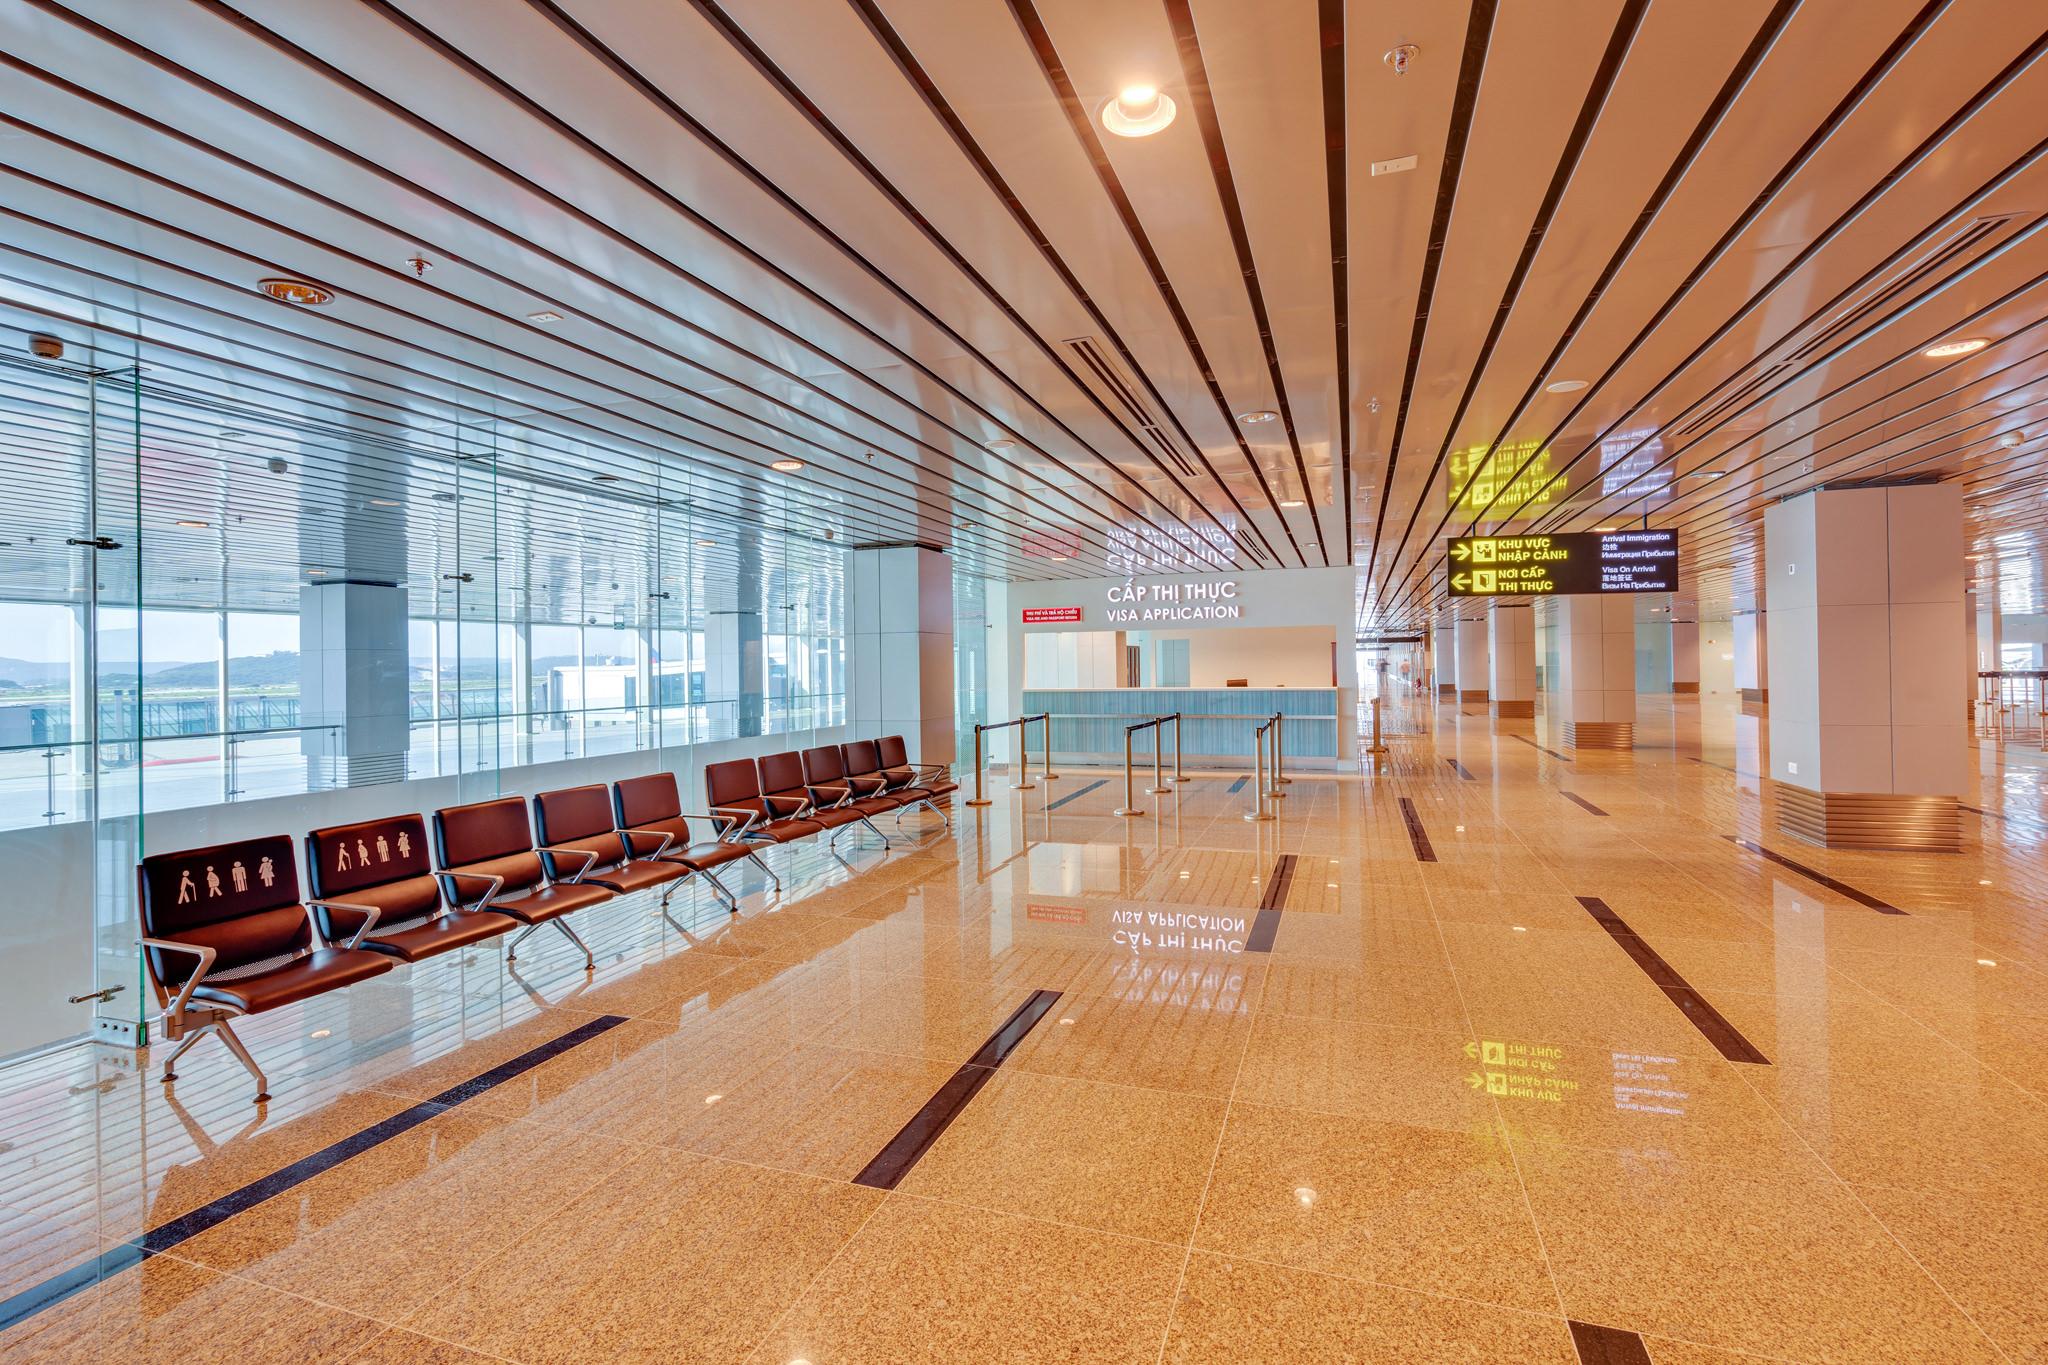 20180626 - Cam Ranh Airport - Architecture - 0167.jpg